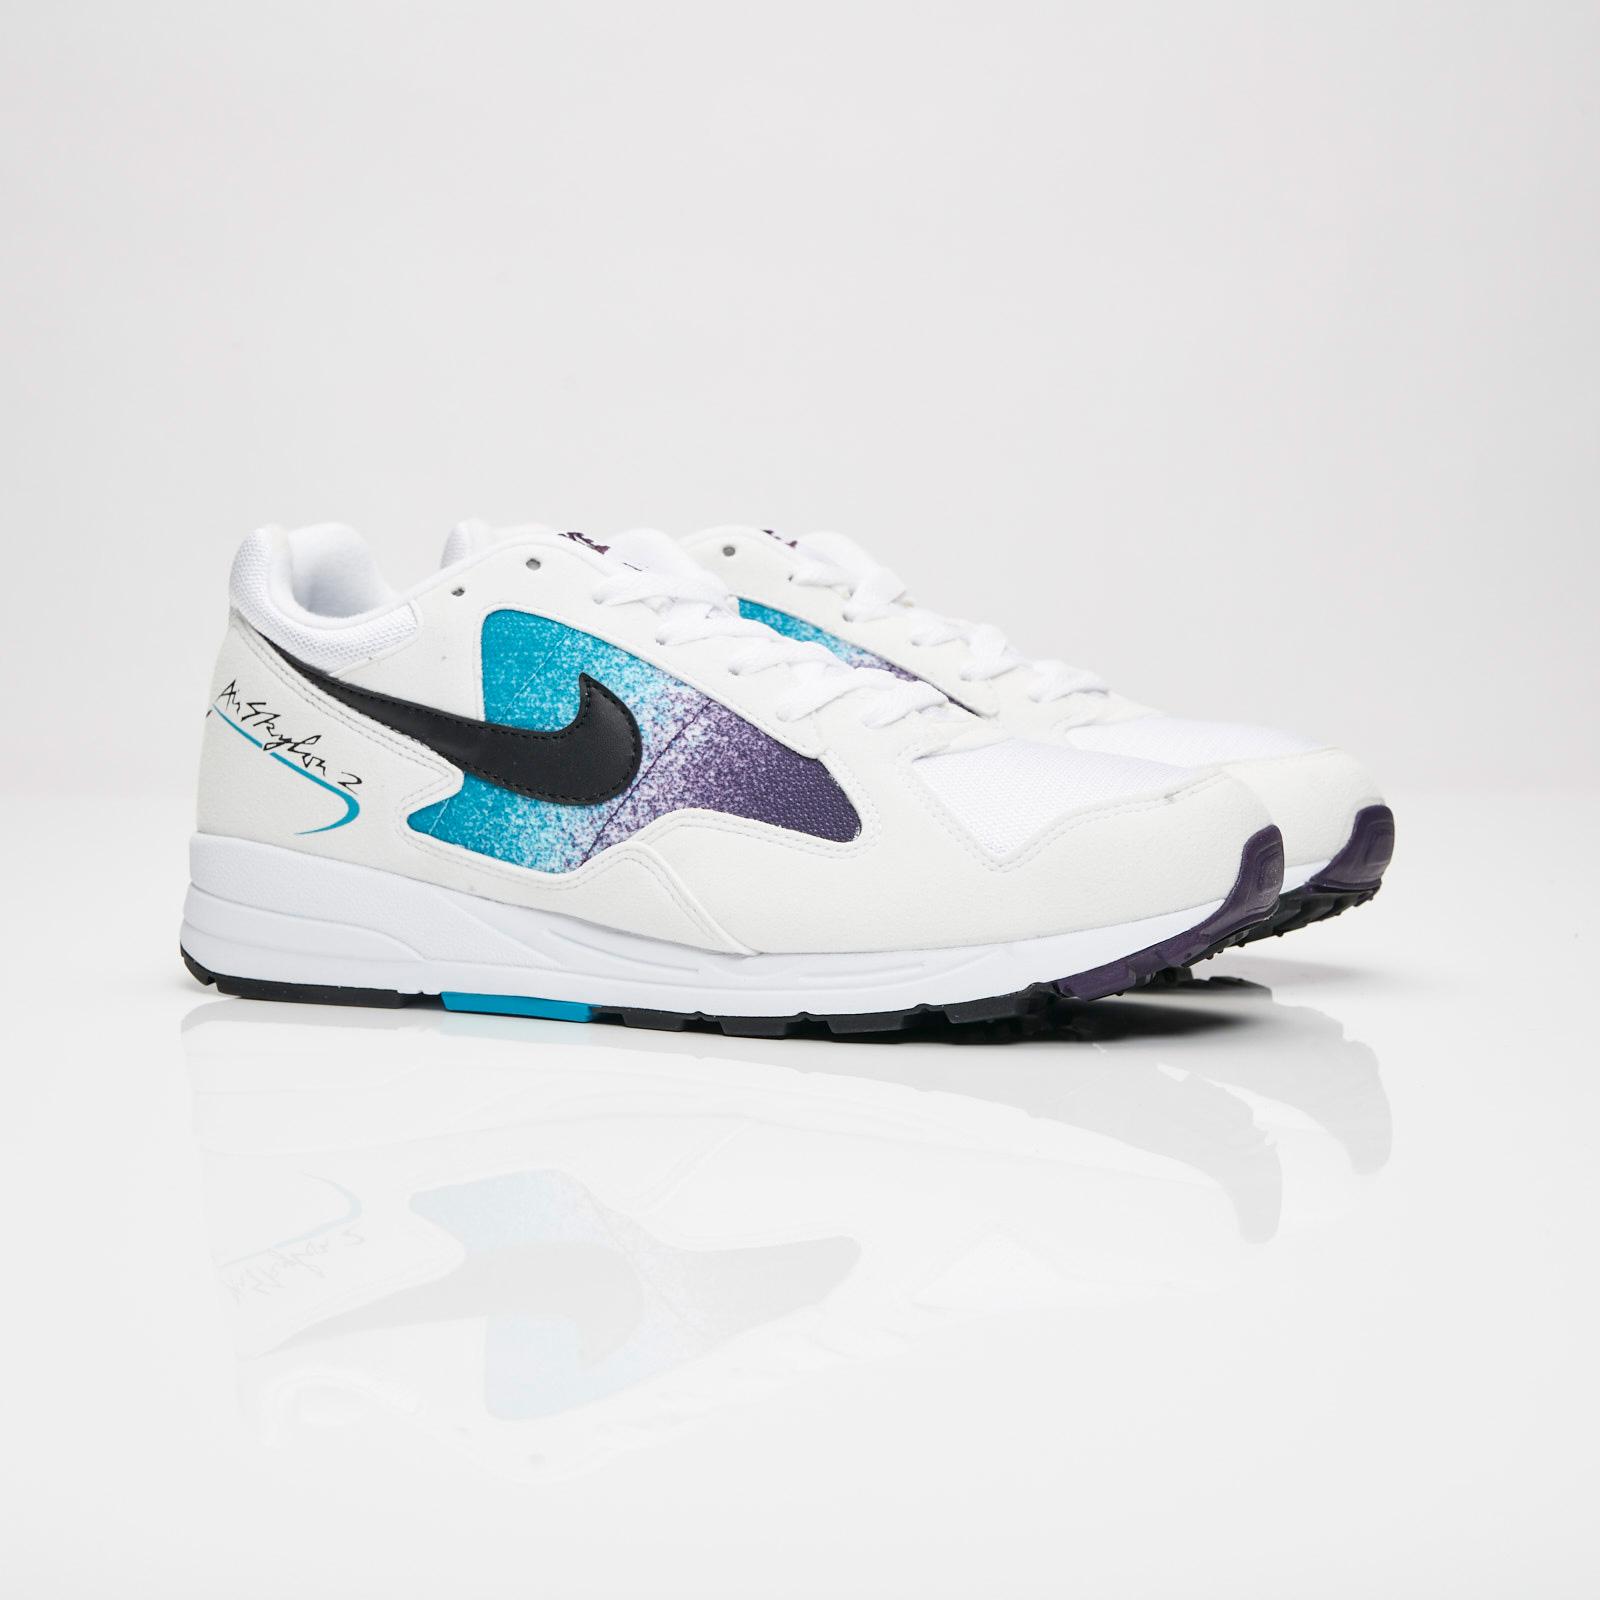 new arrival ce7b2 9ab5c Nike Running Air Skylon II